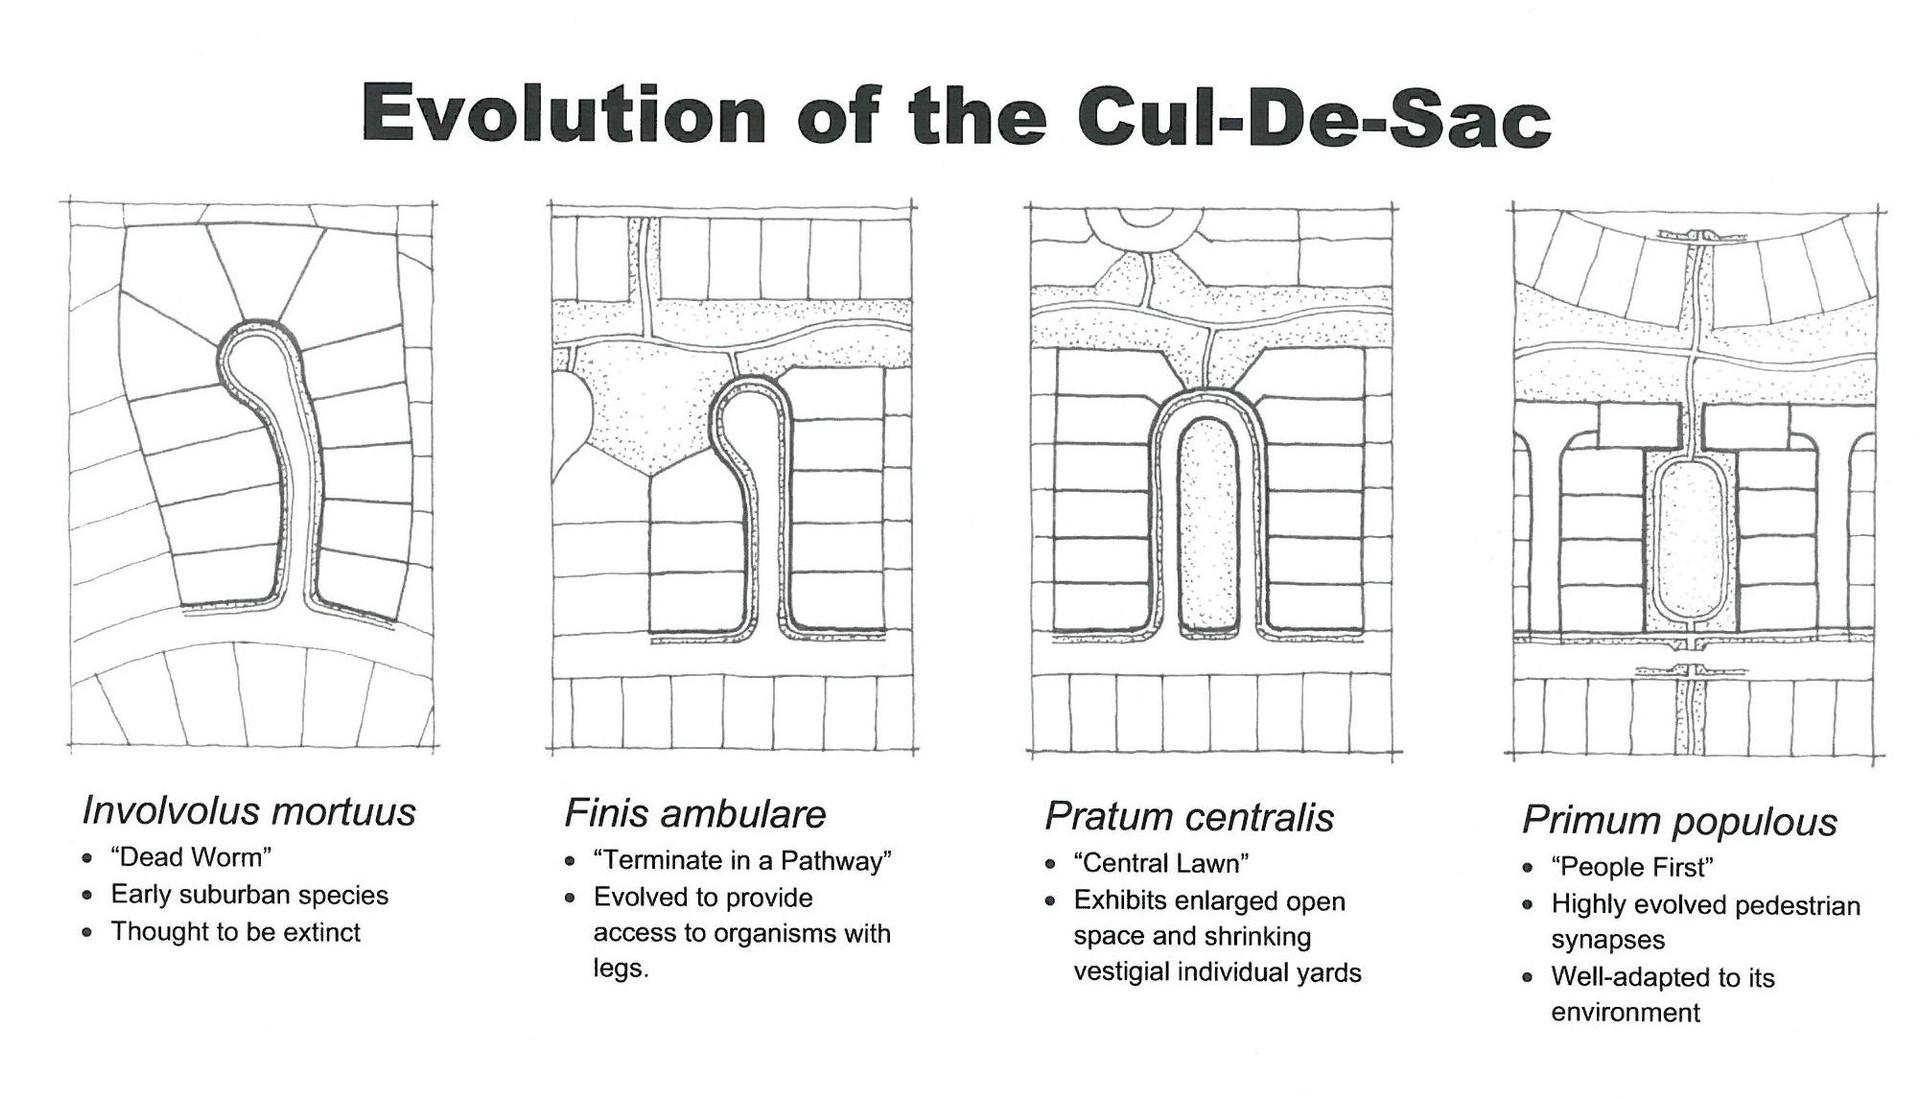 Evolution of the Cul-de-sac